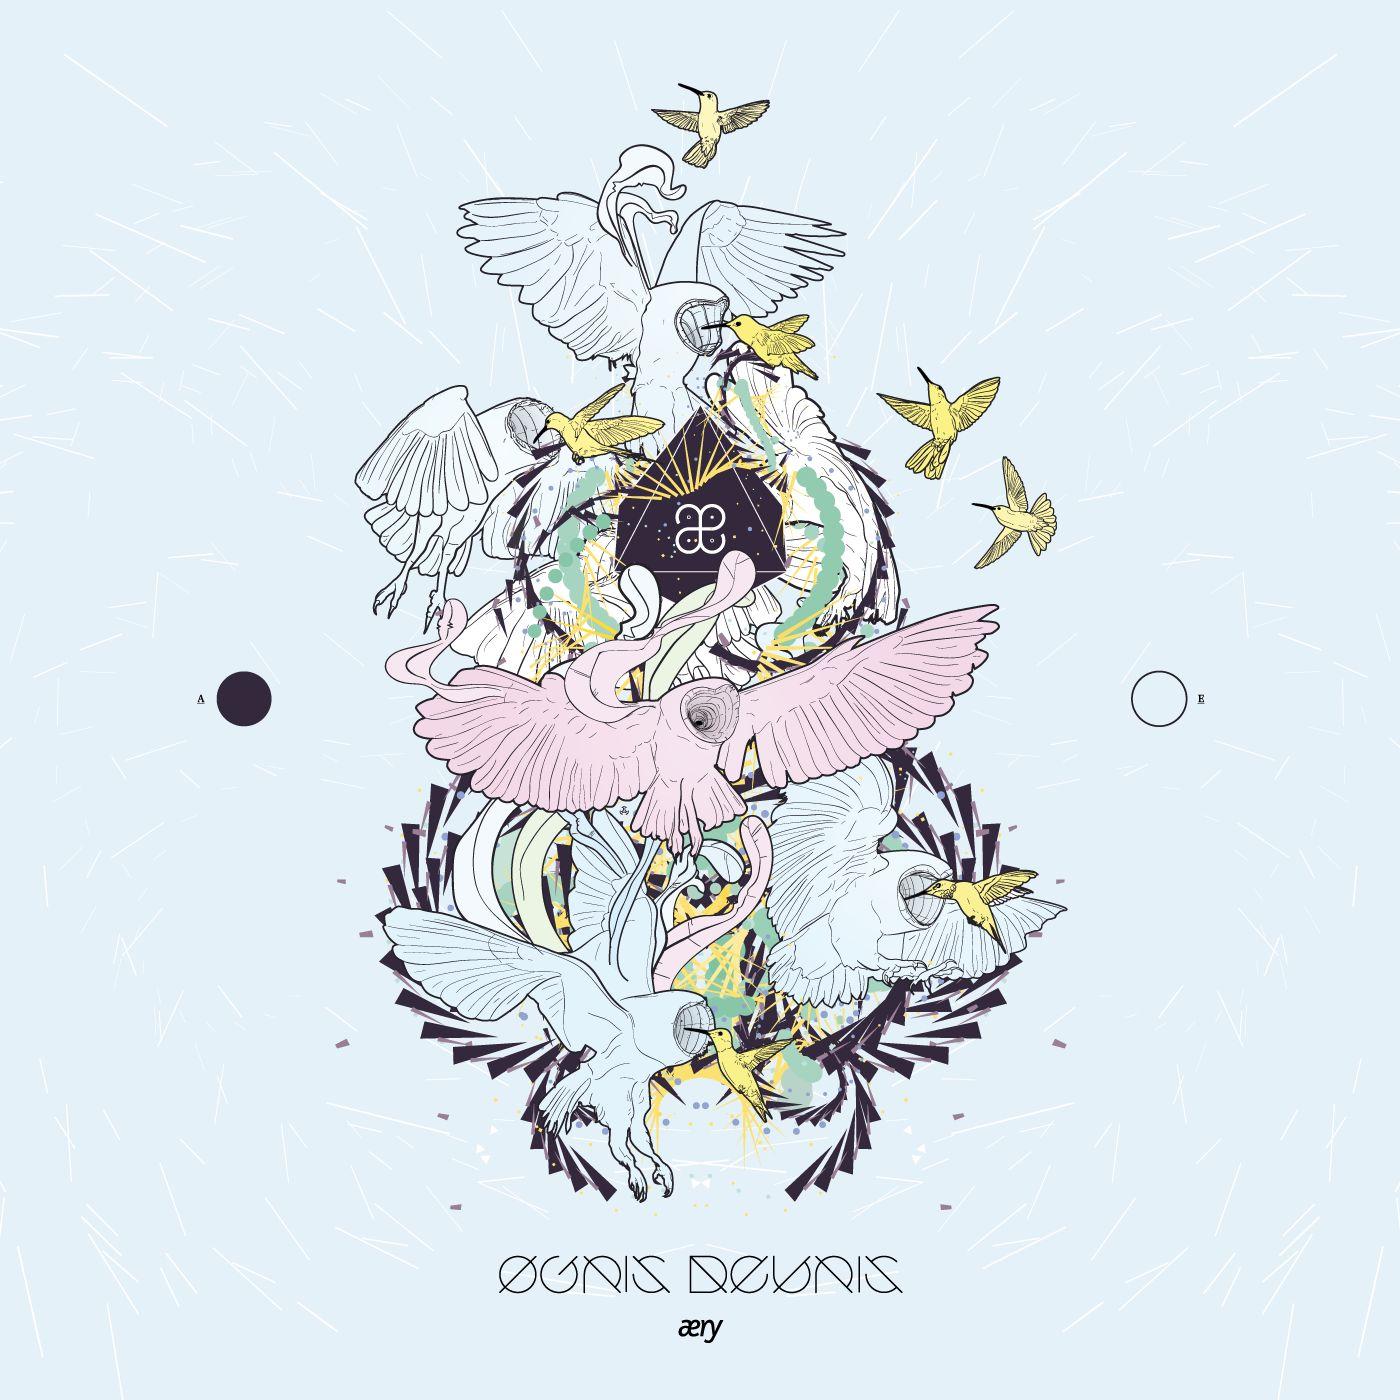 Ogris Debris - Aery EP